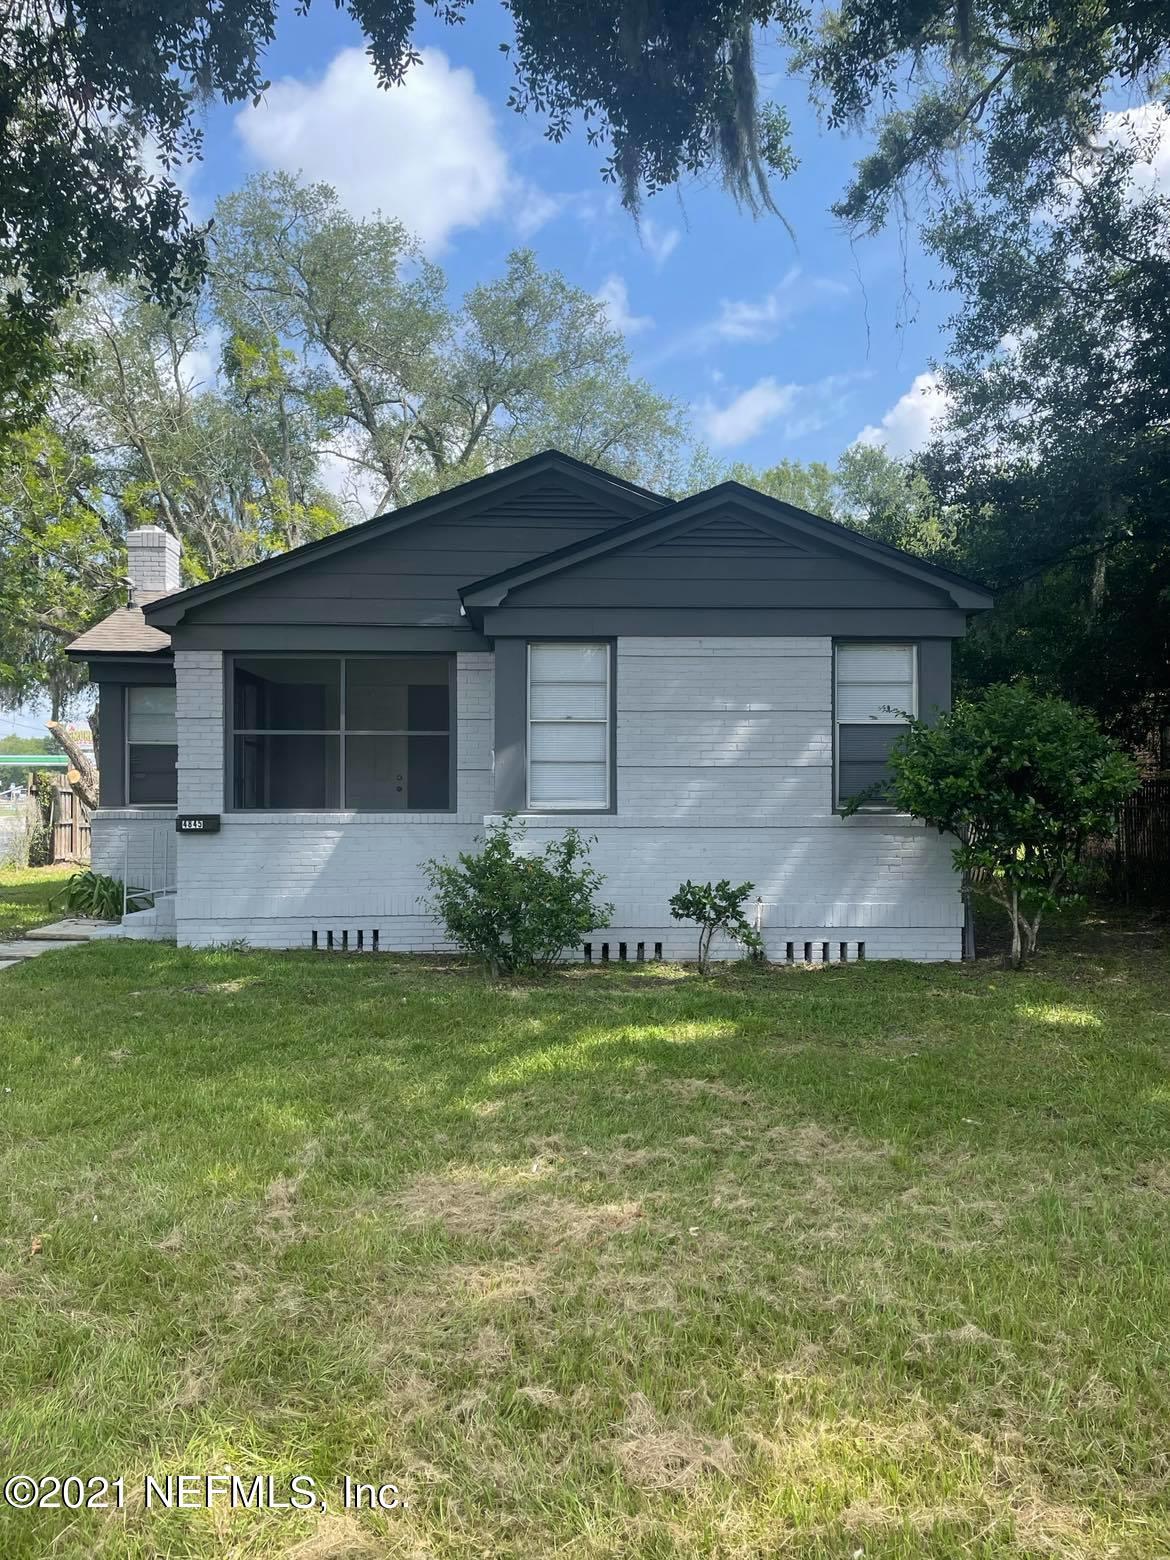 4845 ATTLEBORO, JACKSONVILLE, FLORIDA 32205, ,Commercial,For sale,ATTLEBORO,1123634